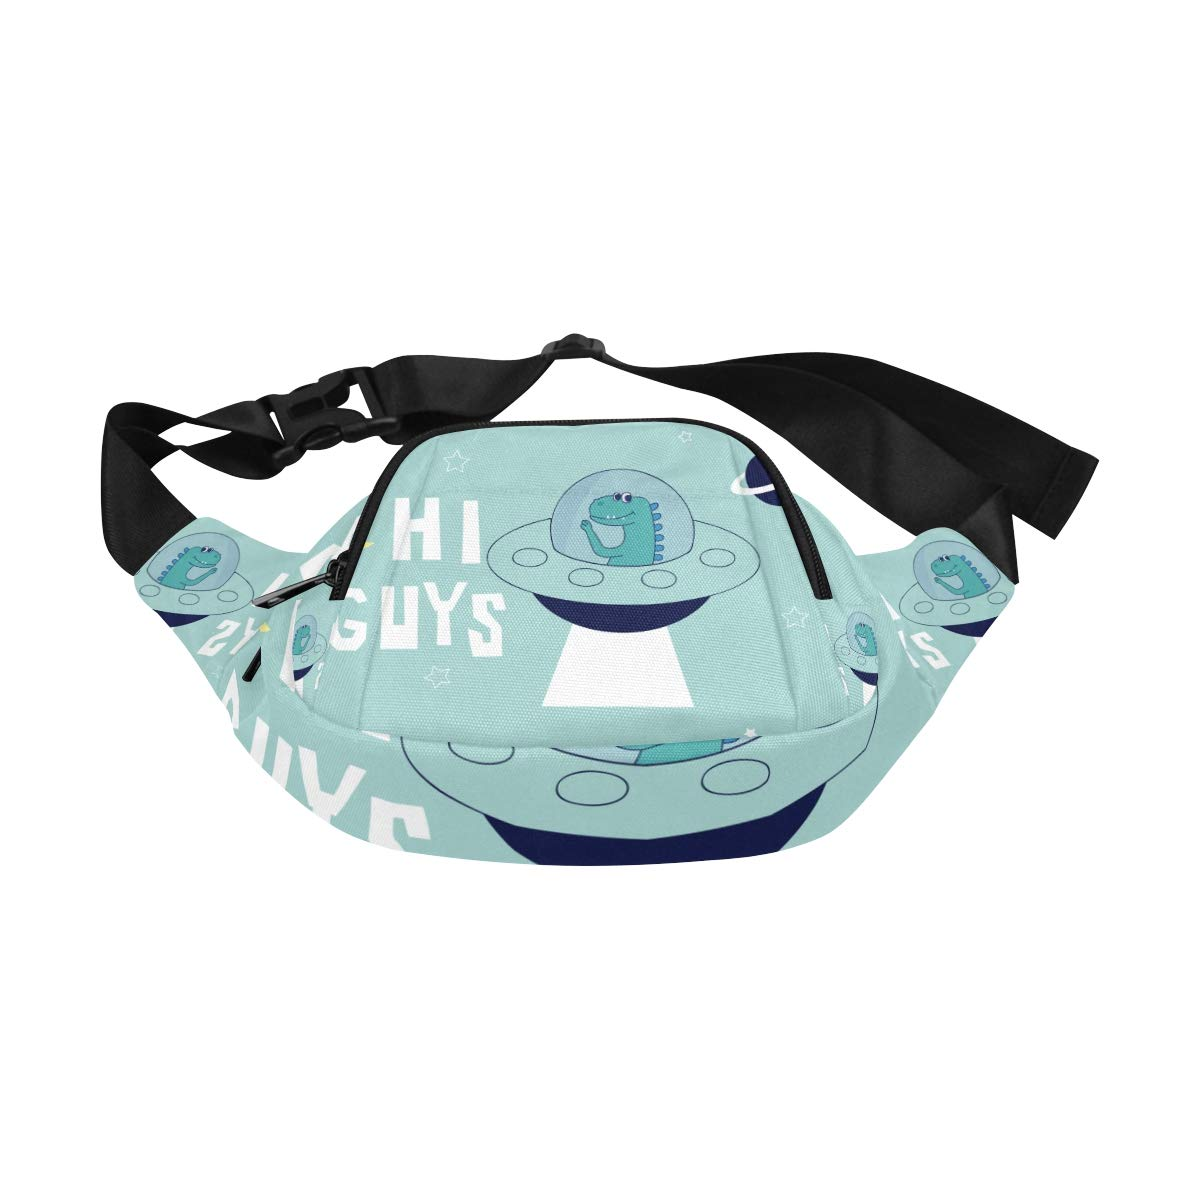 Astronaut Dinosaur In The Space Fenny Packs Waist Bags Adjustable Belt Waterproof Nylon Travel Running Sport Vacation Party For Men Women Boys Girls Kids